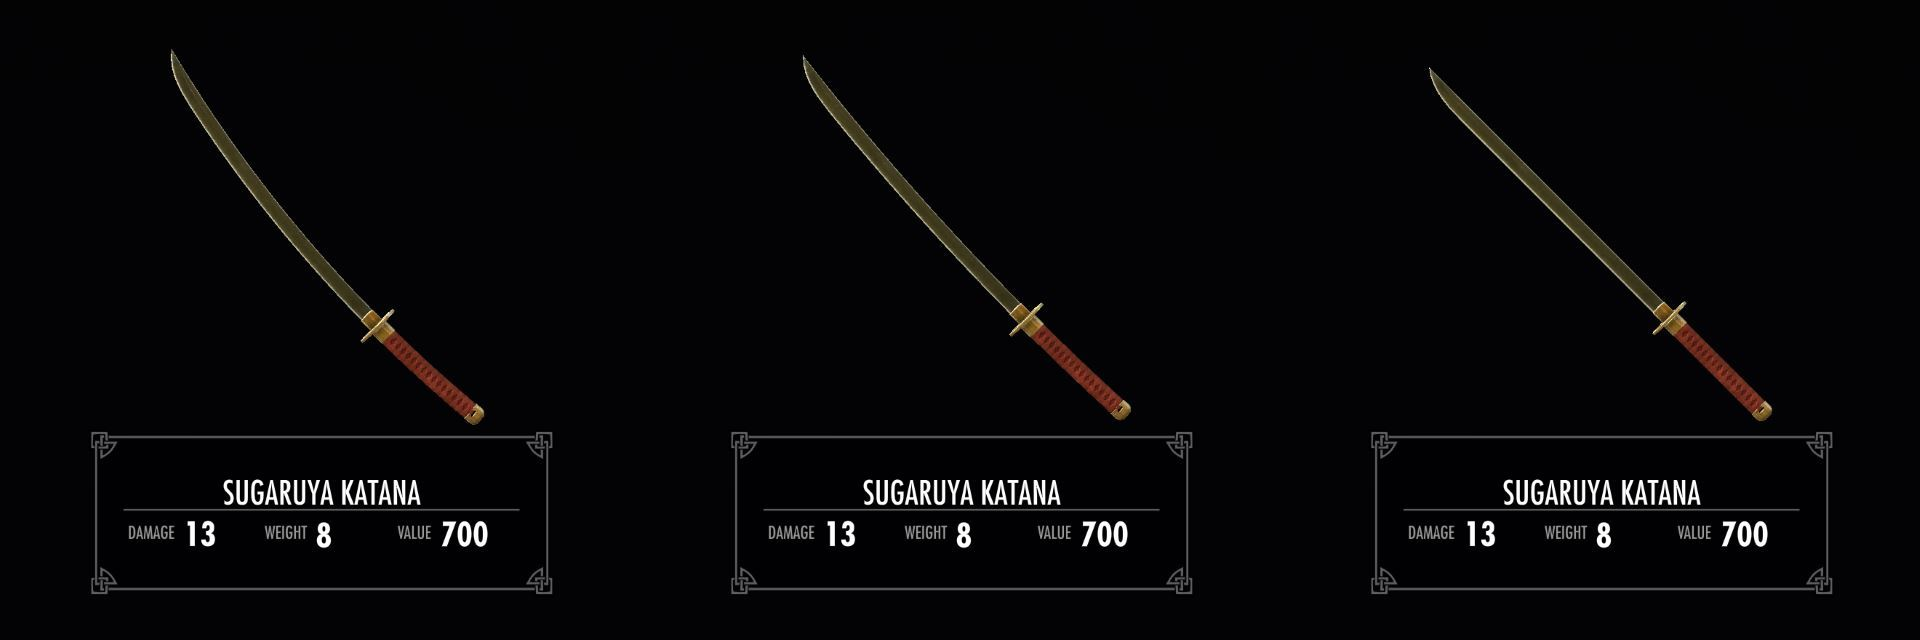 Skyrim SE / LE]: Mod紹介 - Sugaruya Katana - 武器 [紹介]